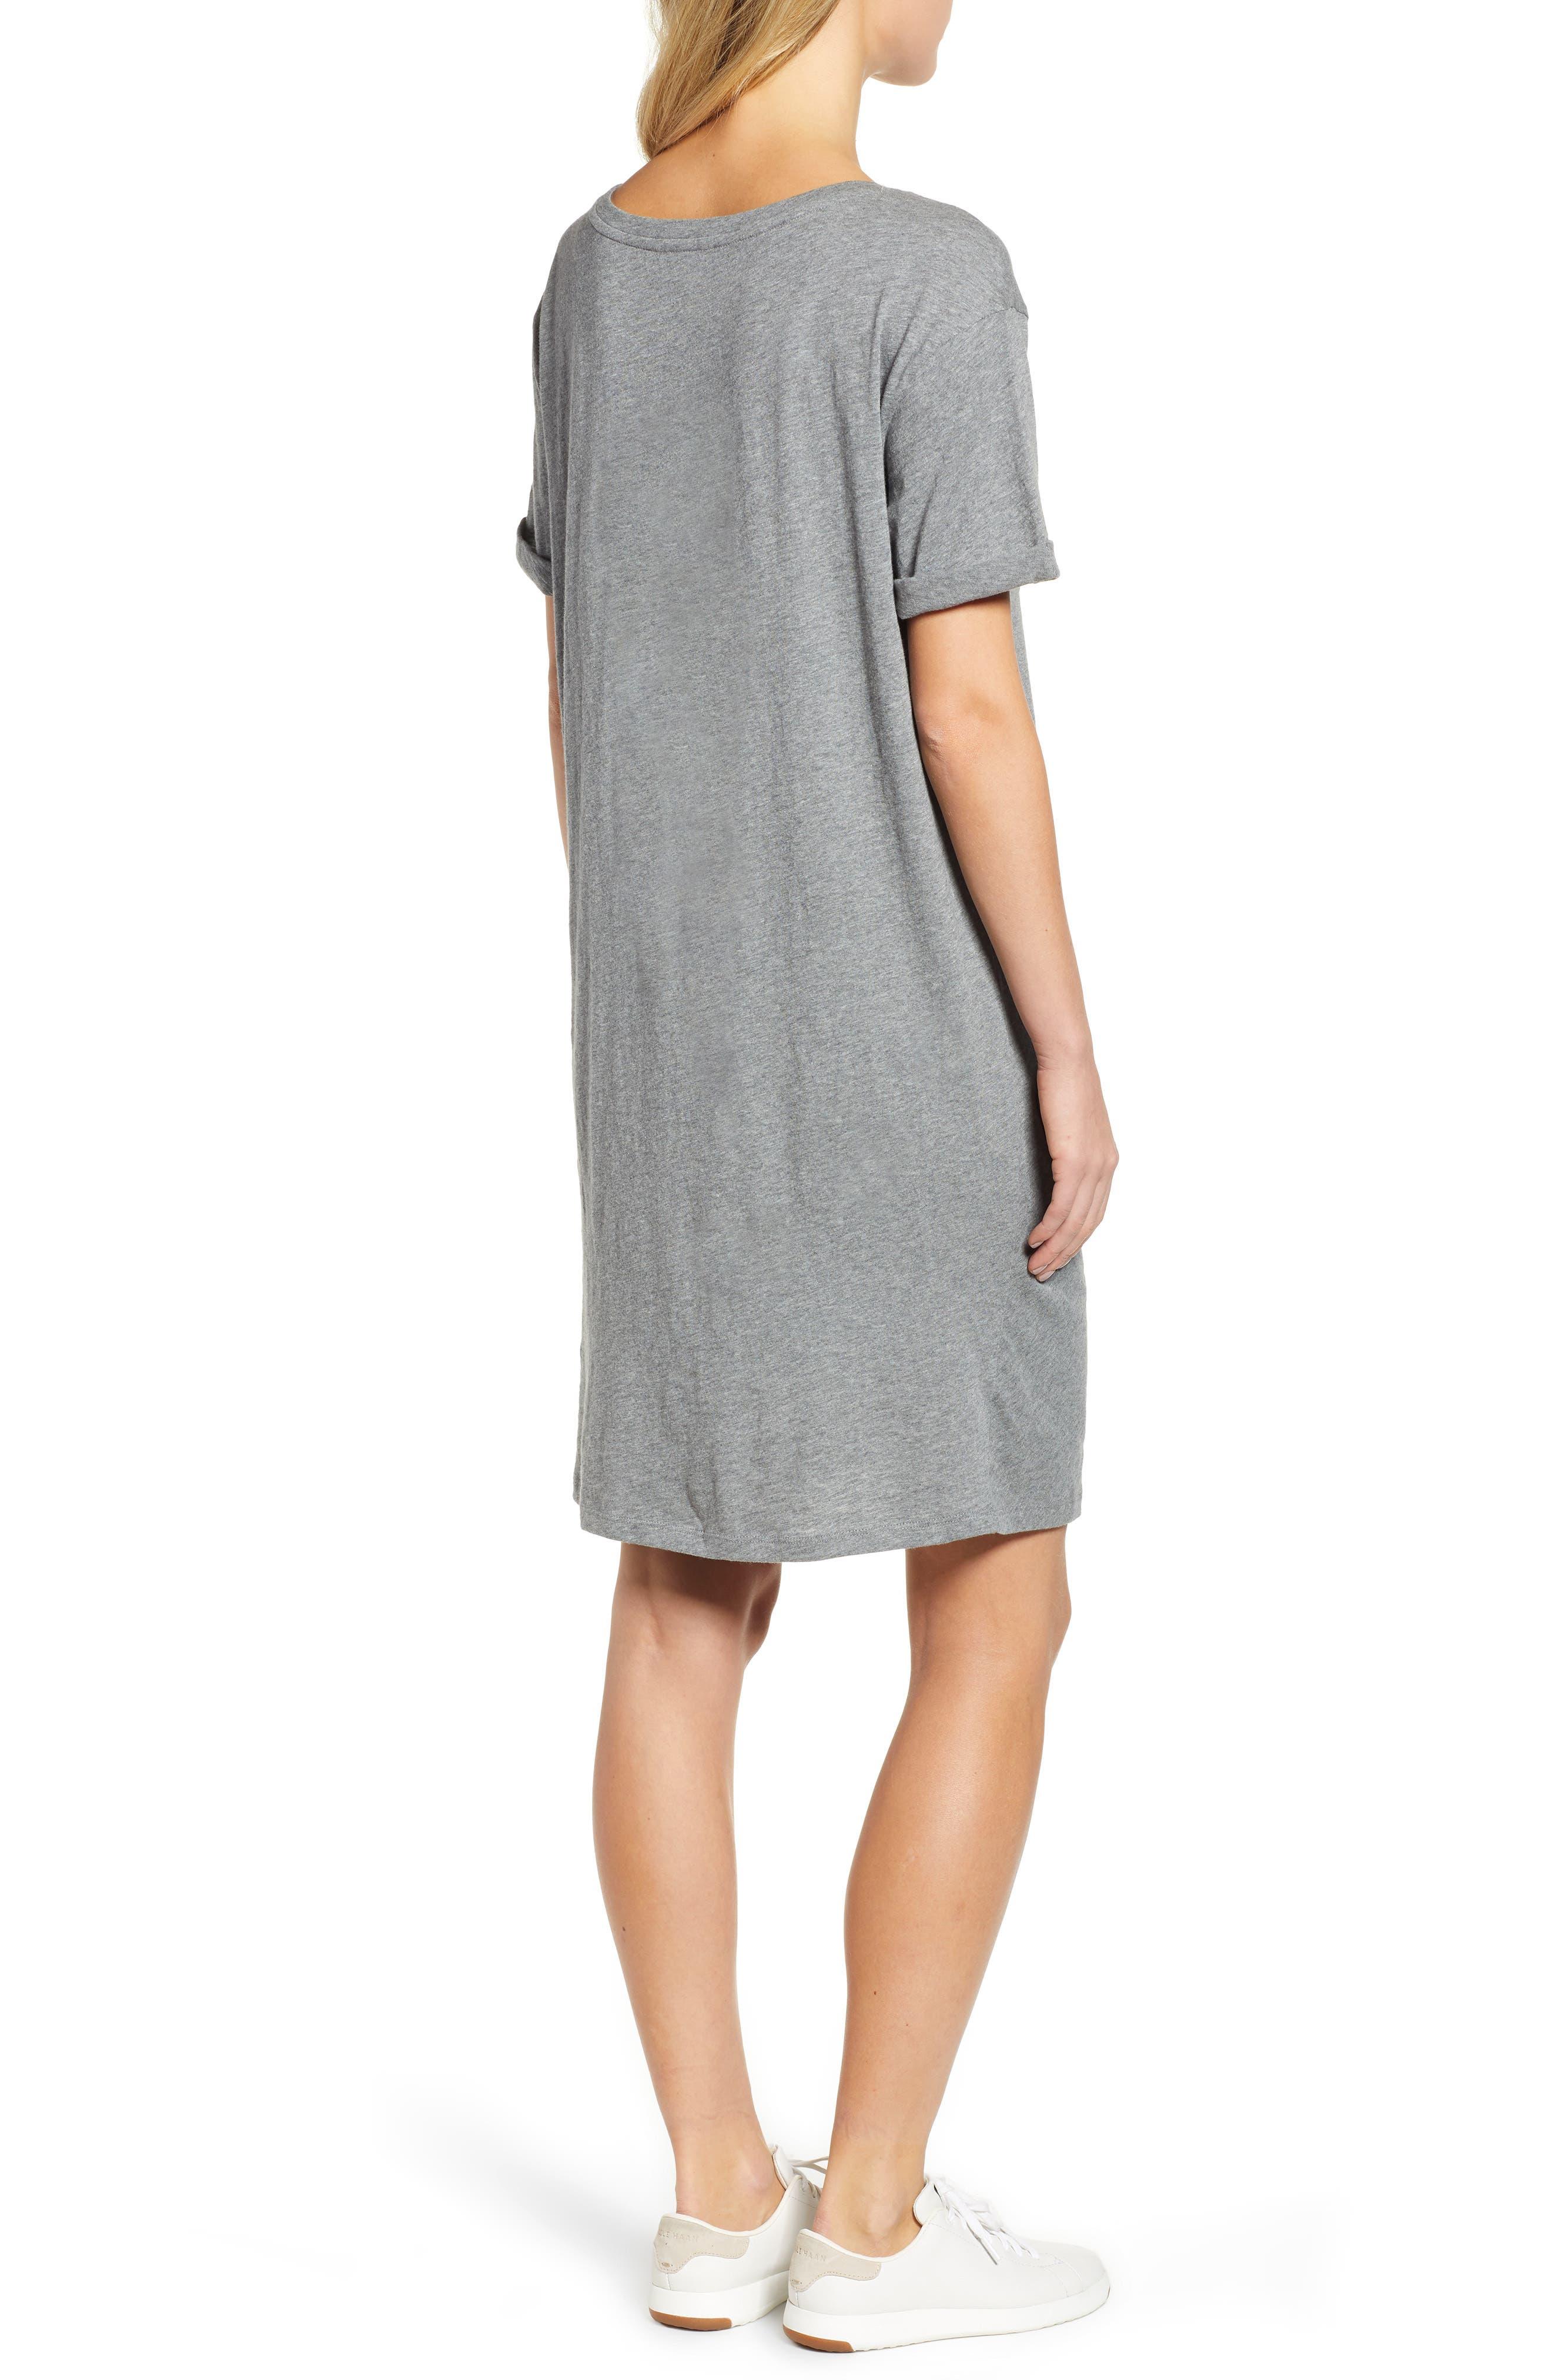 Knot Front T-Shirt Dress,                             Alternate thumbnail 2, color,                             GREY DARK HEATHER